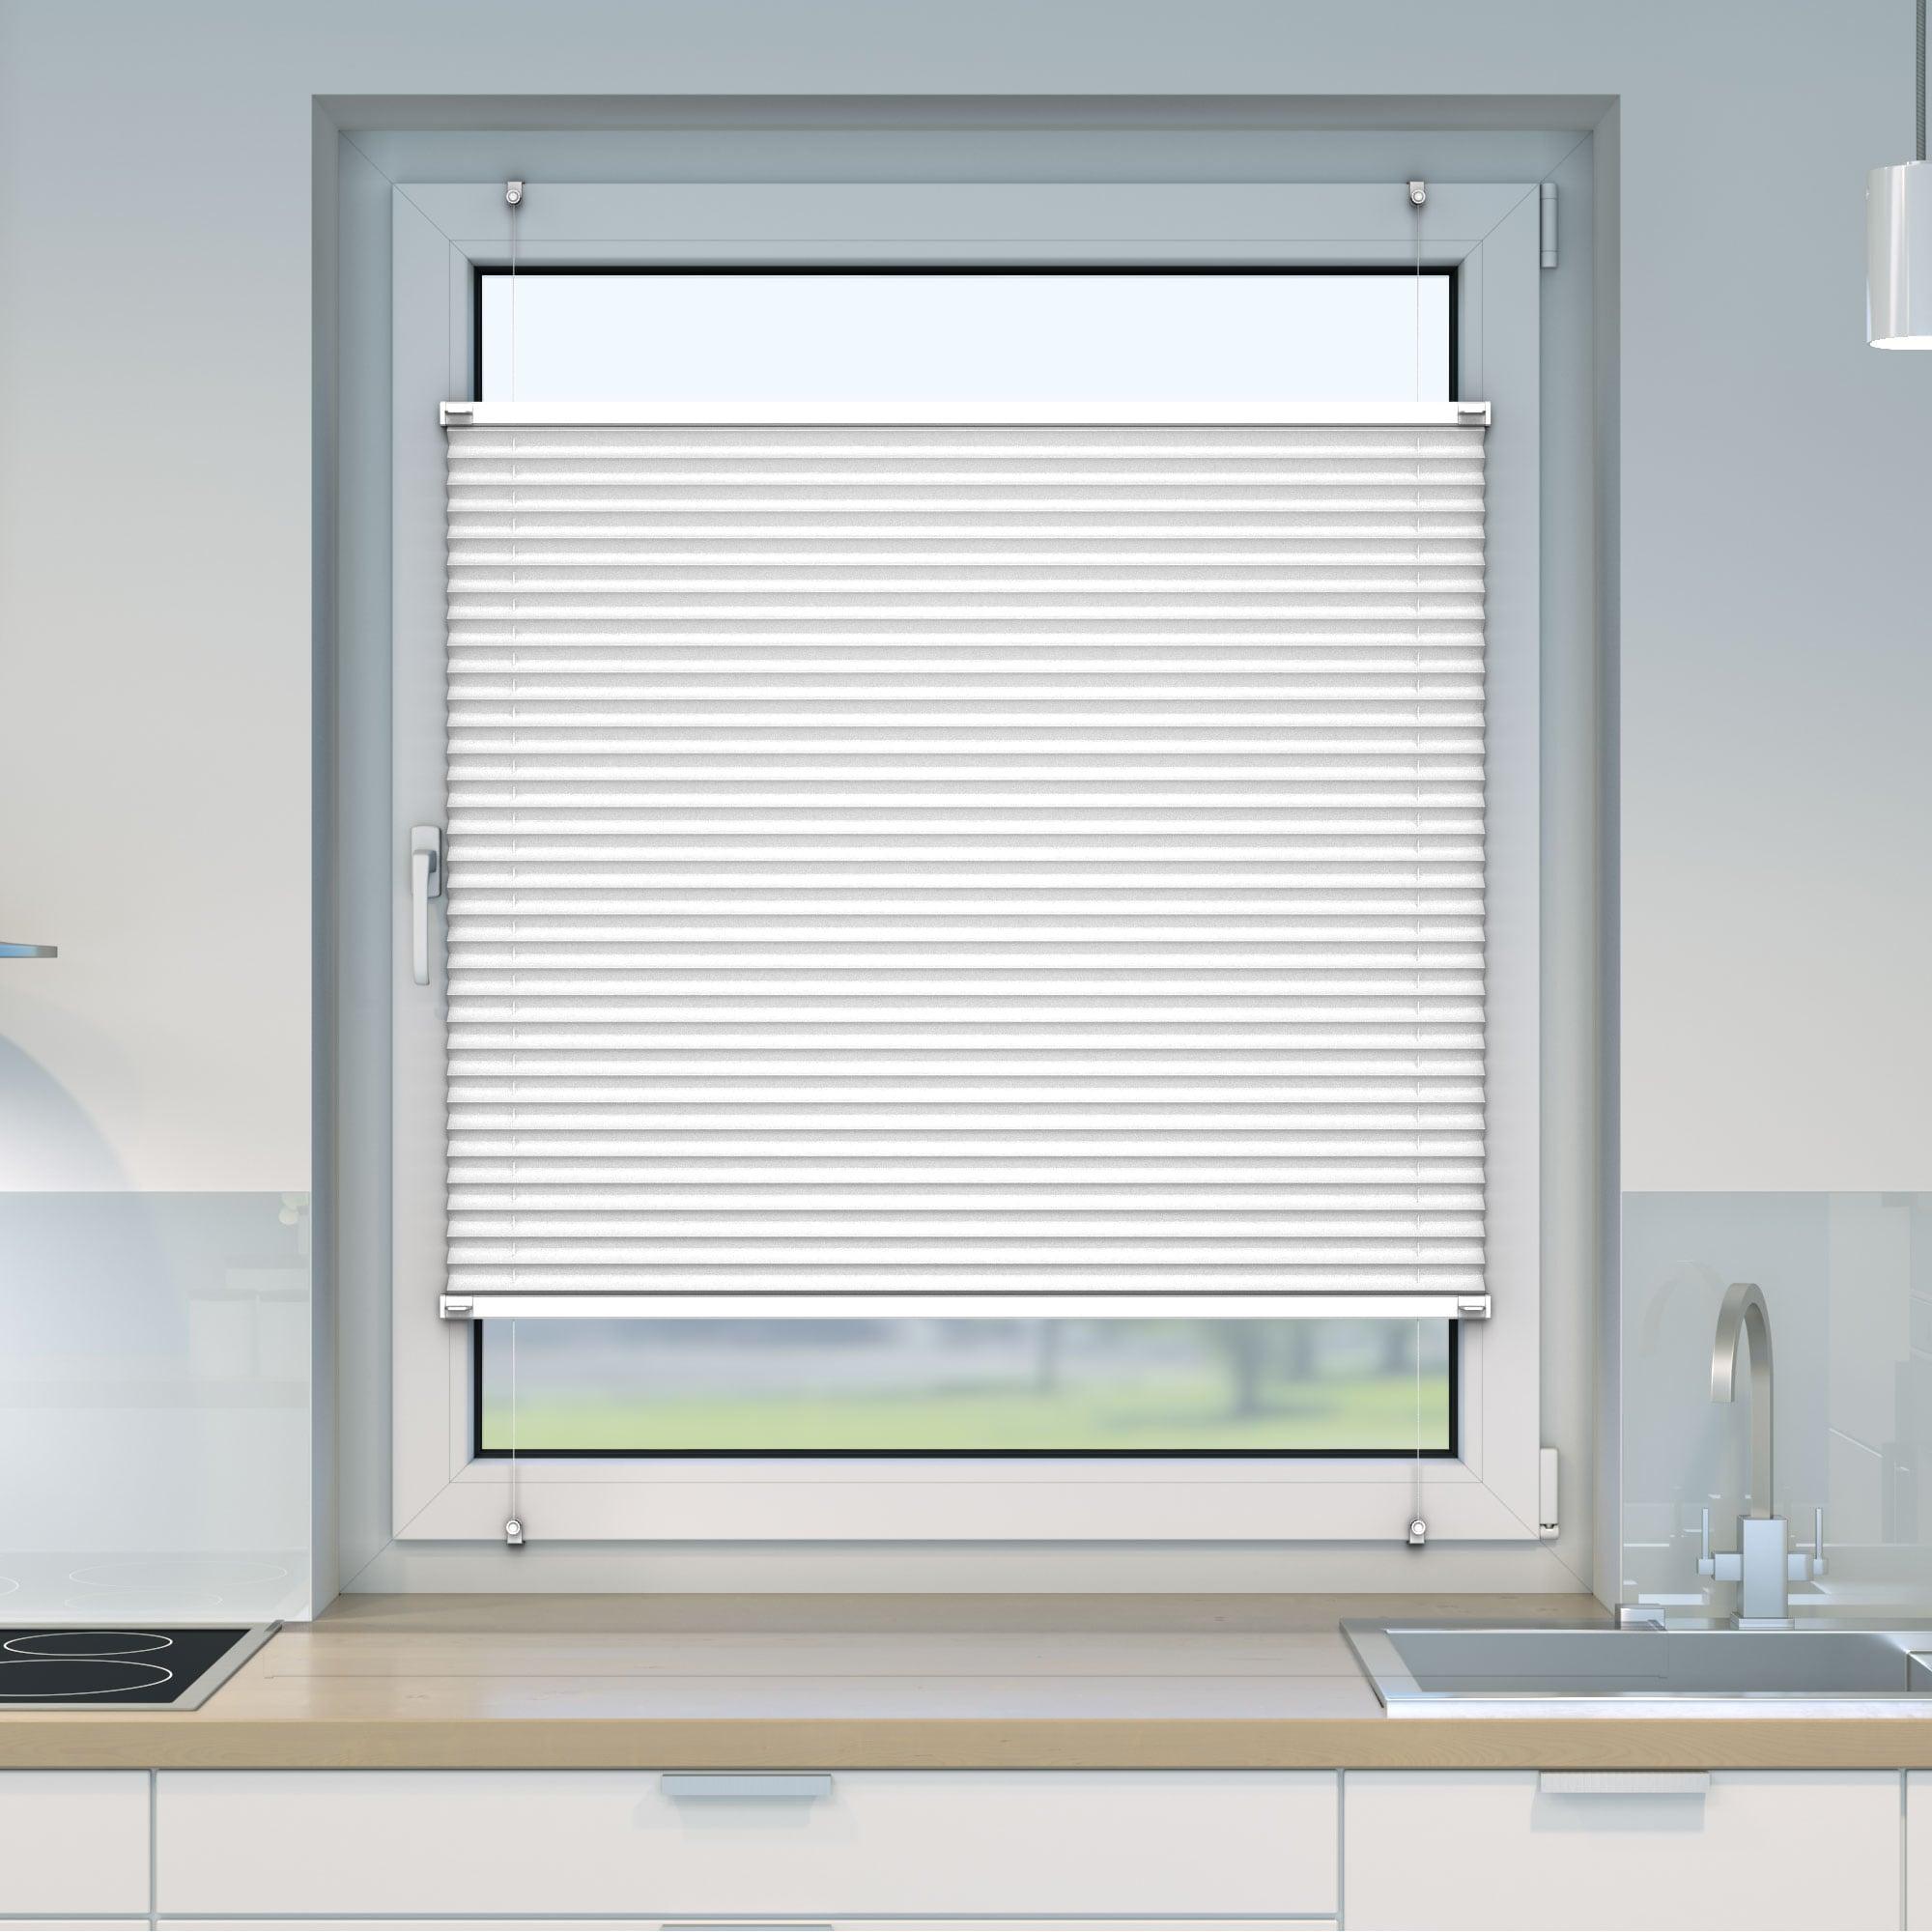 Klemmfix-Plissee-Faltrollo-ohne-Bohren-Fenster-Tuer-Plisseerollo-Plisee-Easyfix Indexbild 21